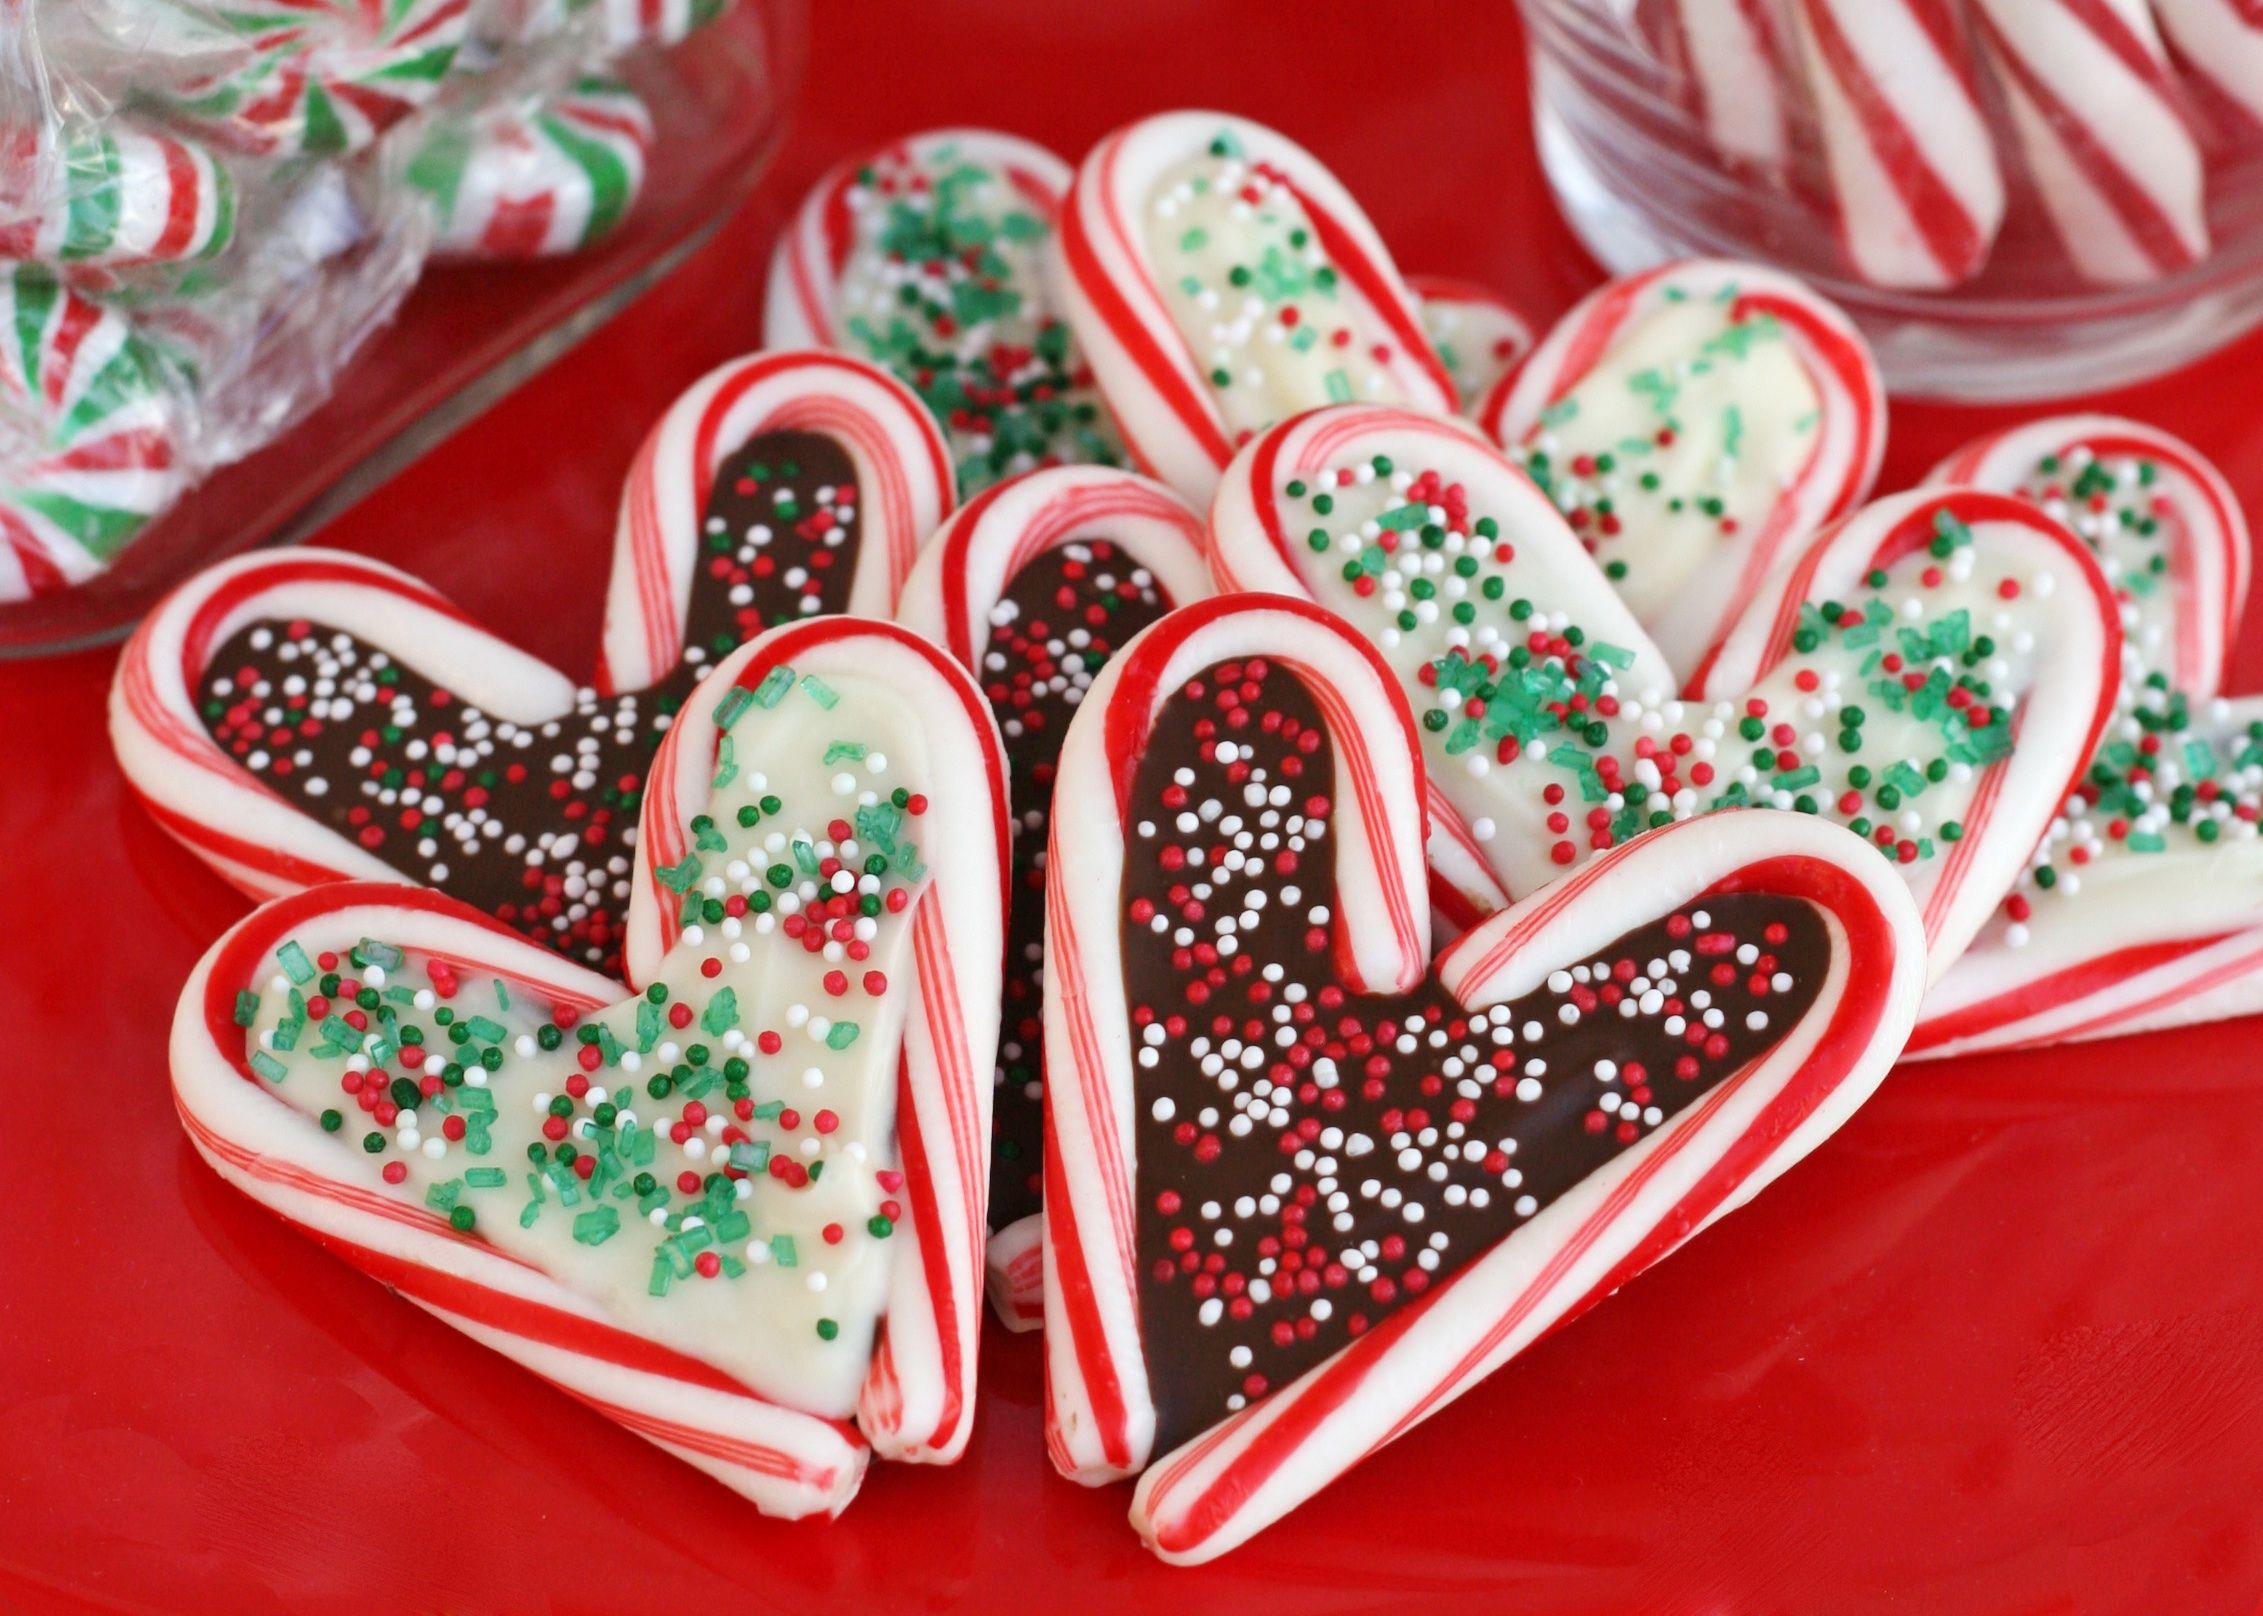 Amazing Edible Christmas Craft Ideas Part - 7: Christmas Fun